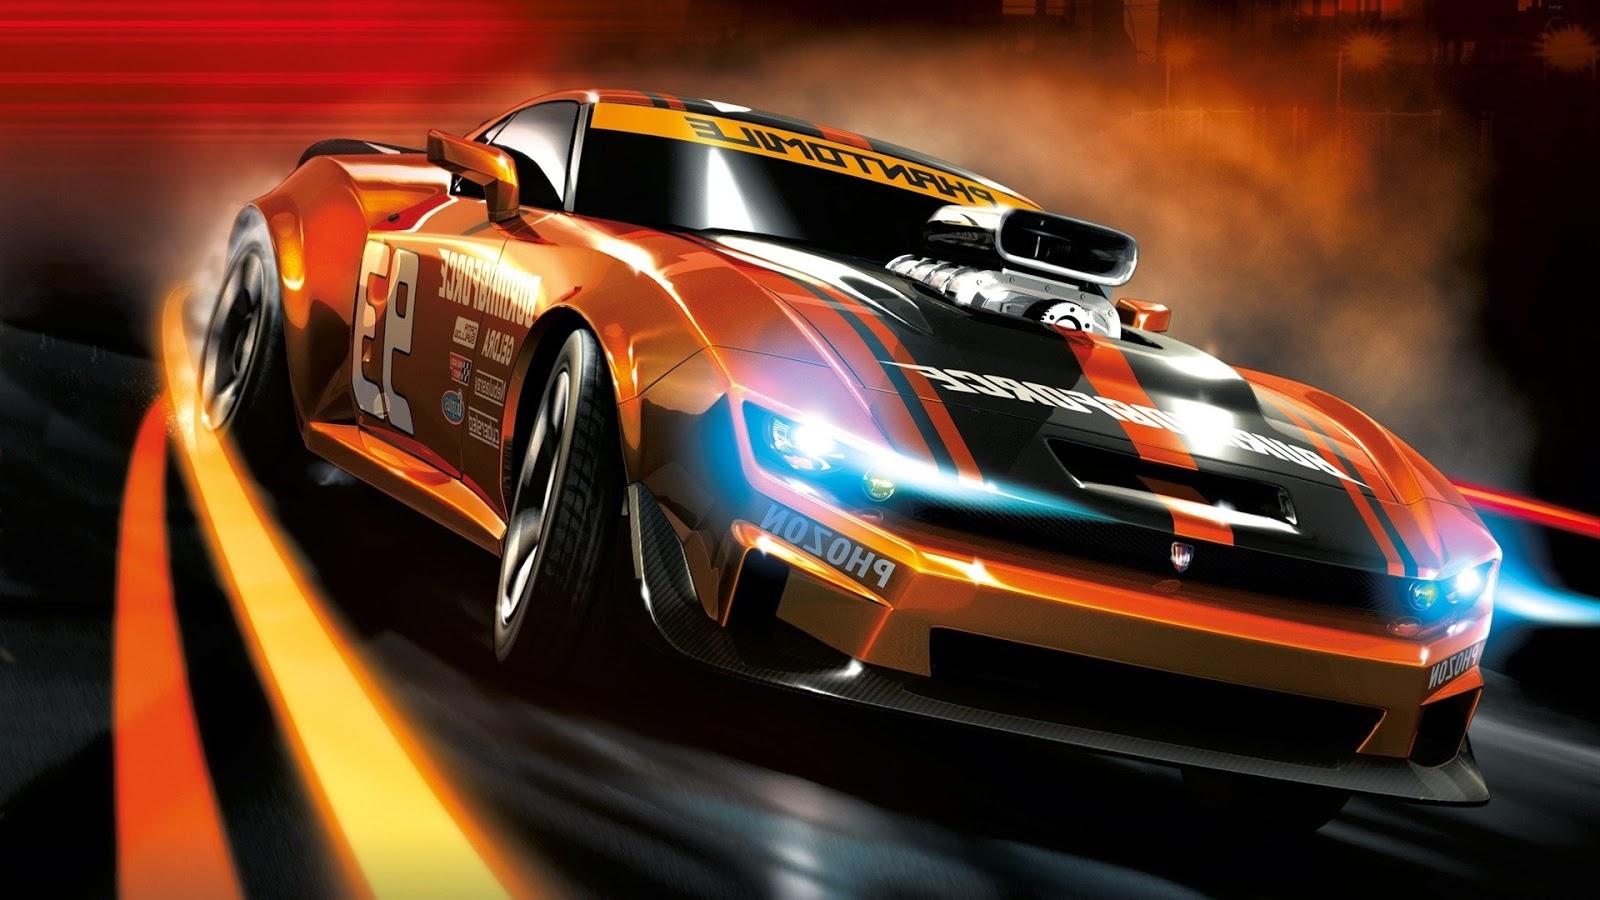 Gambar Wallpaper Modifikasi Mobil Balap Drag Race  Modif